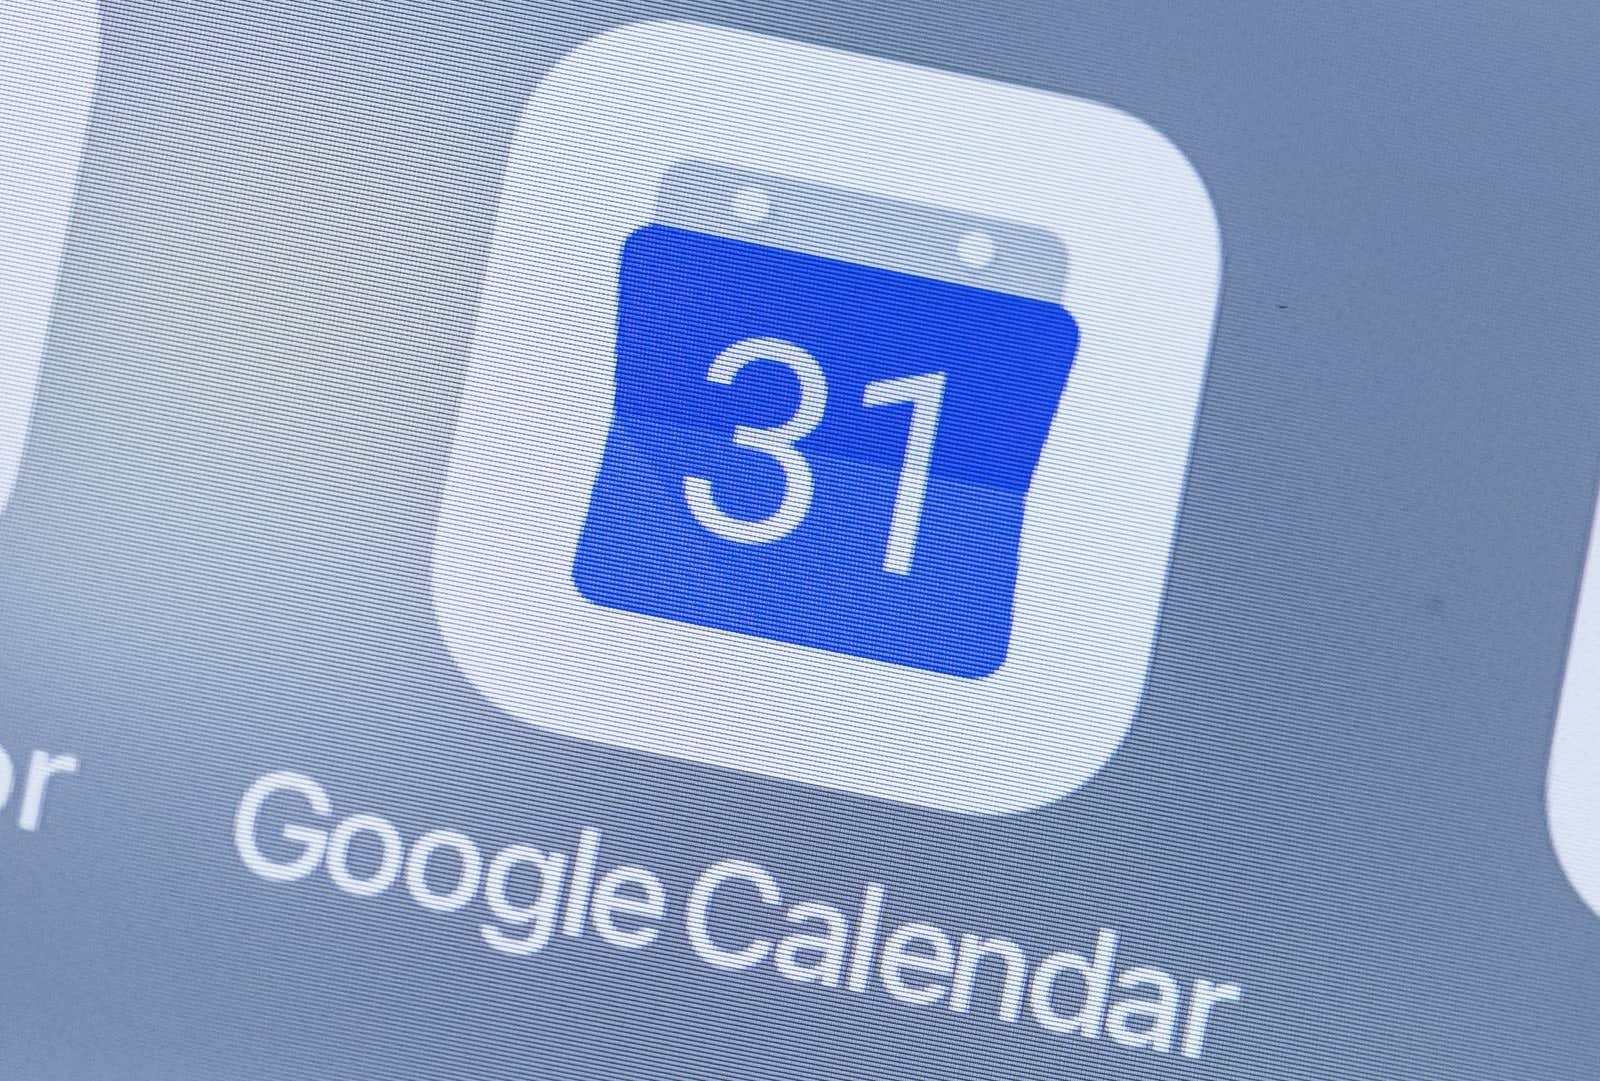 Google has a '.new' shortcut for creating Calendar events